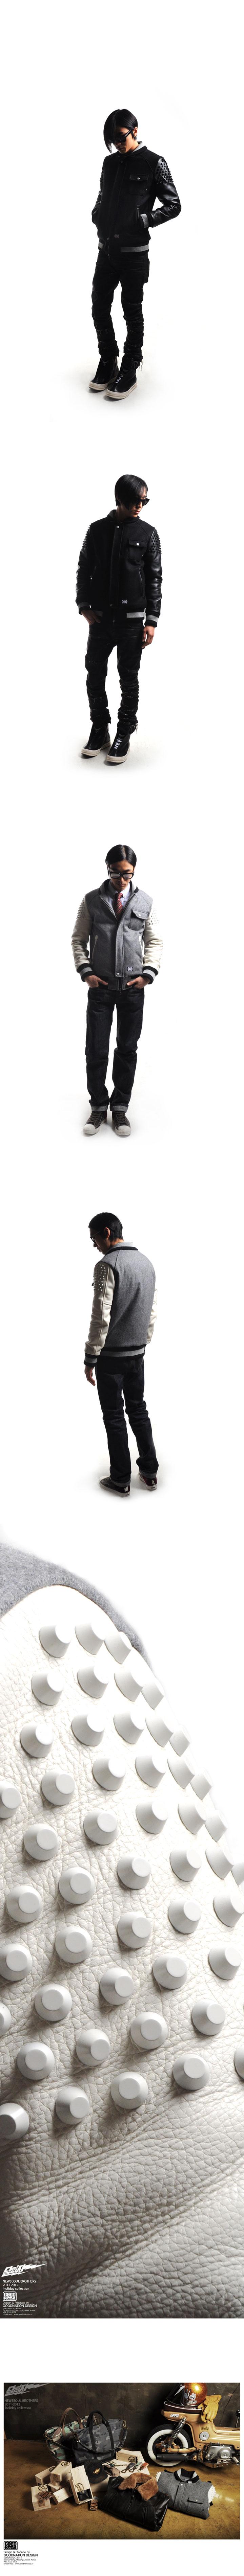 NSB NSB 2011-2012 하이퍼 스터디럭스 자켓 발매